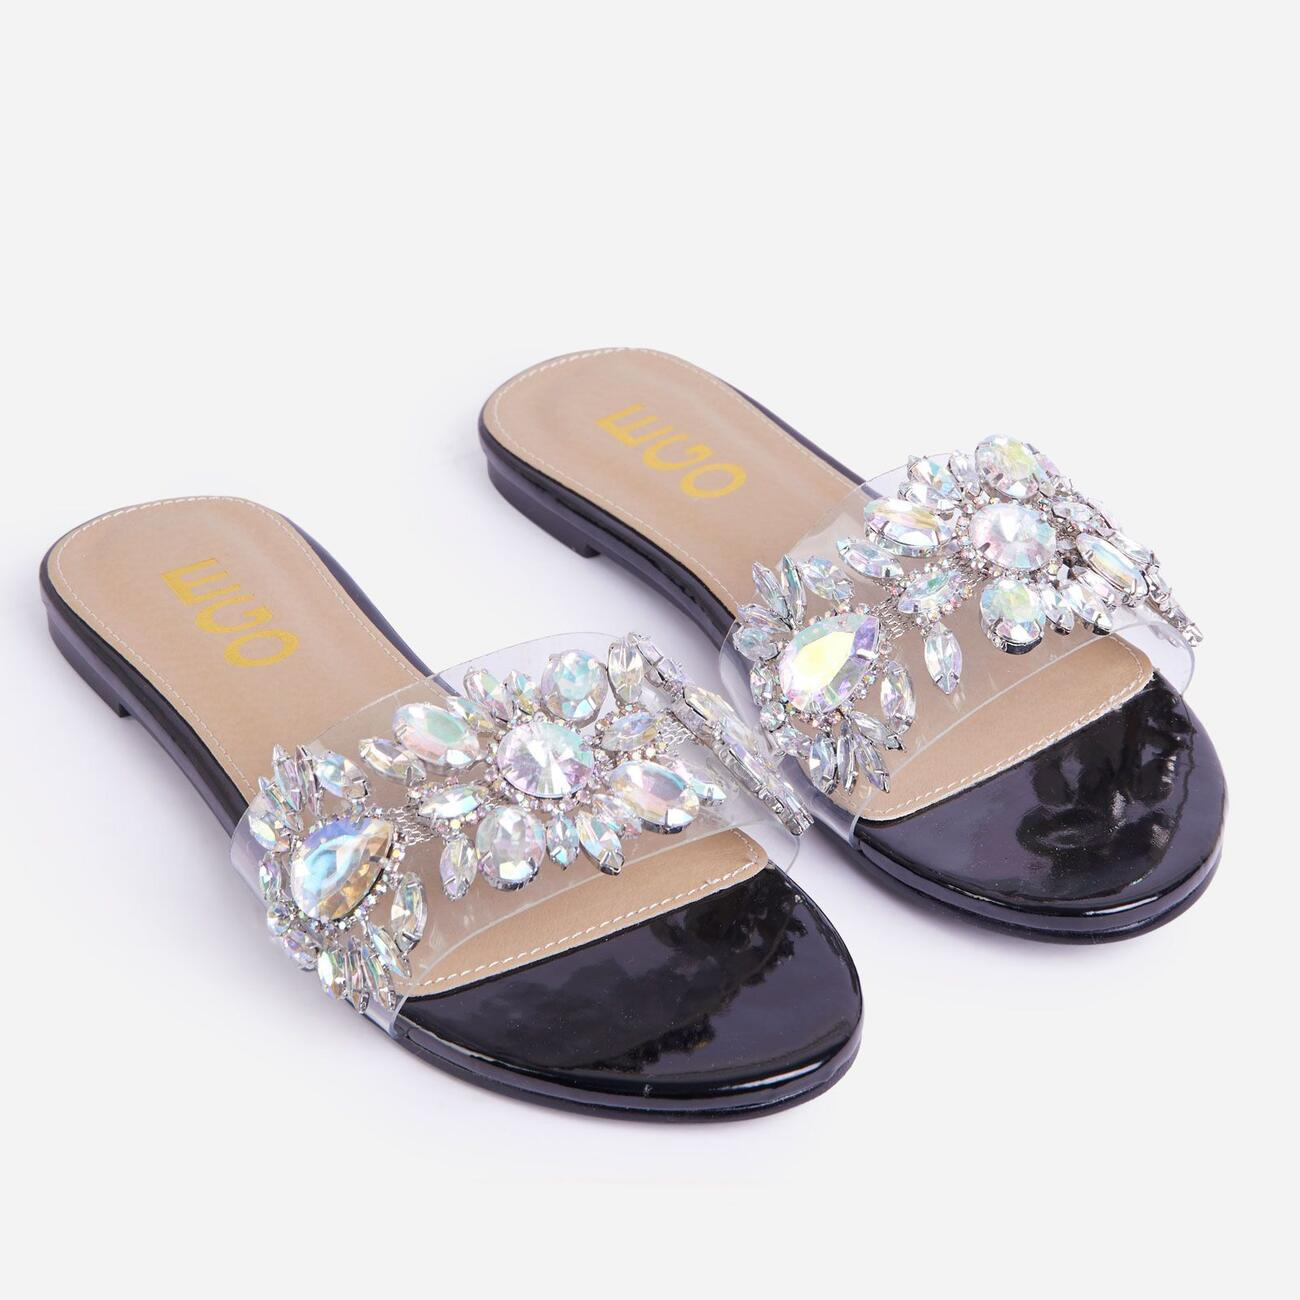 Duchess Diamante Gem Detail Perspex Flat Slider Sandal In Black Patent Image 2